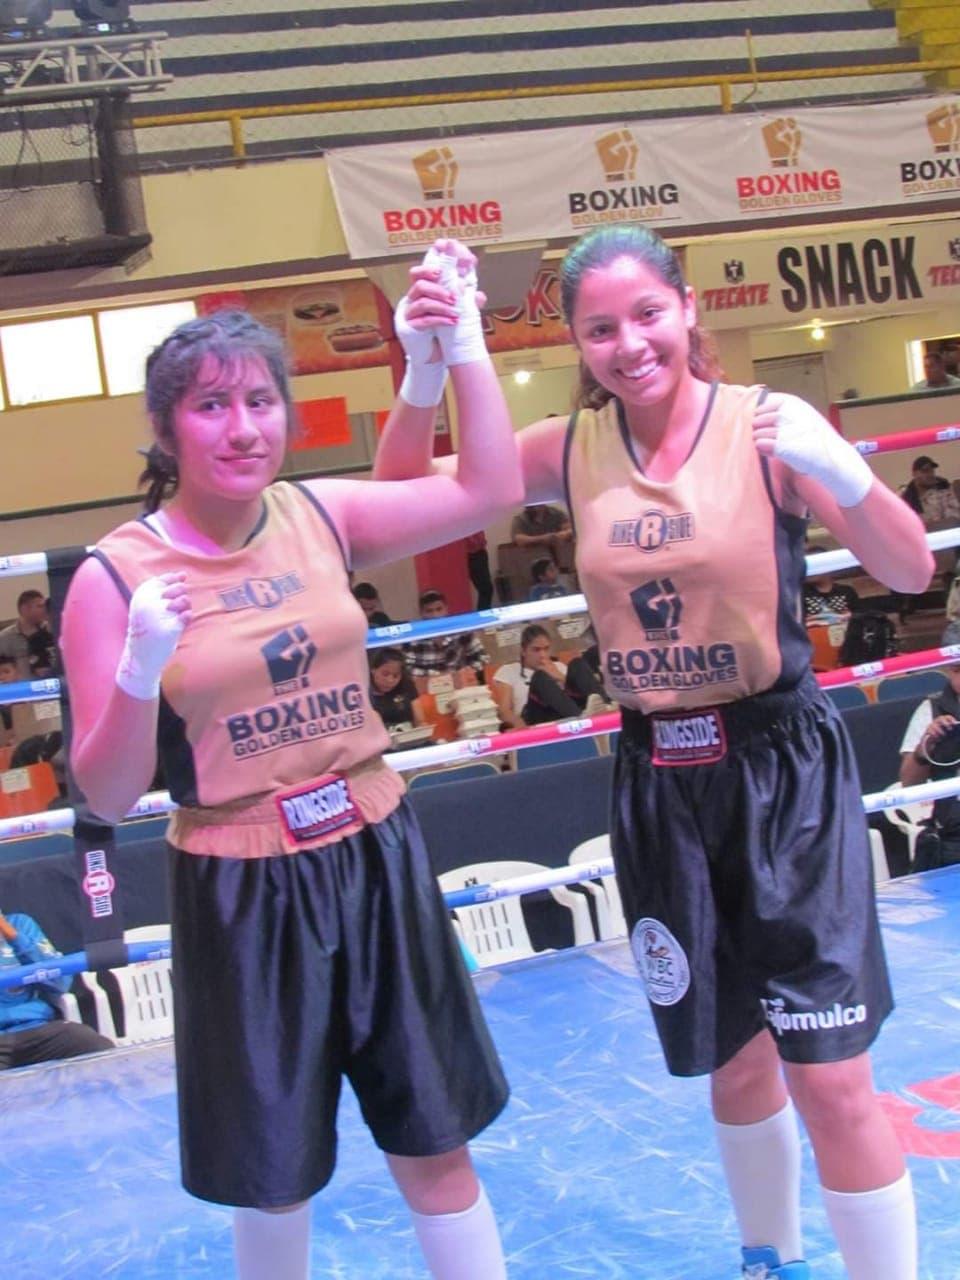 Tapatía Corza ganó el Boxing Golden Gloves 2